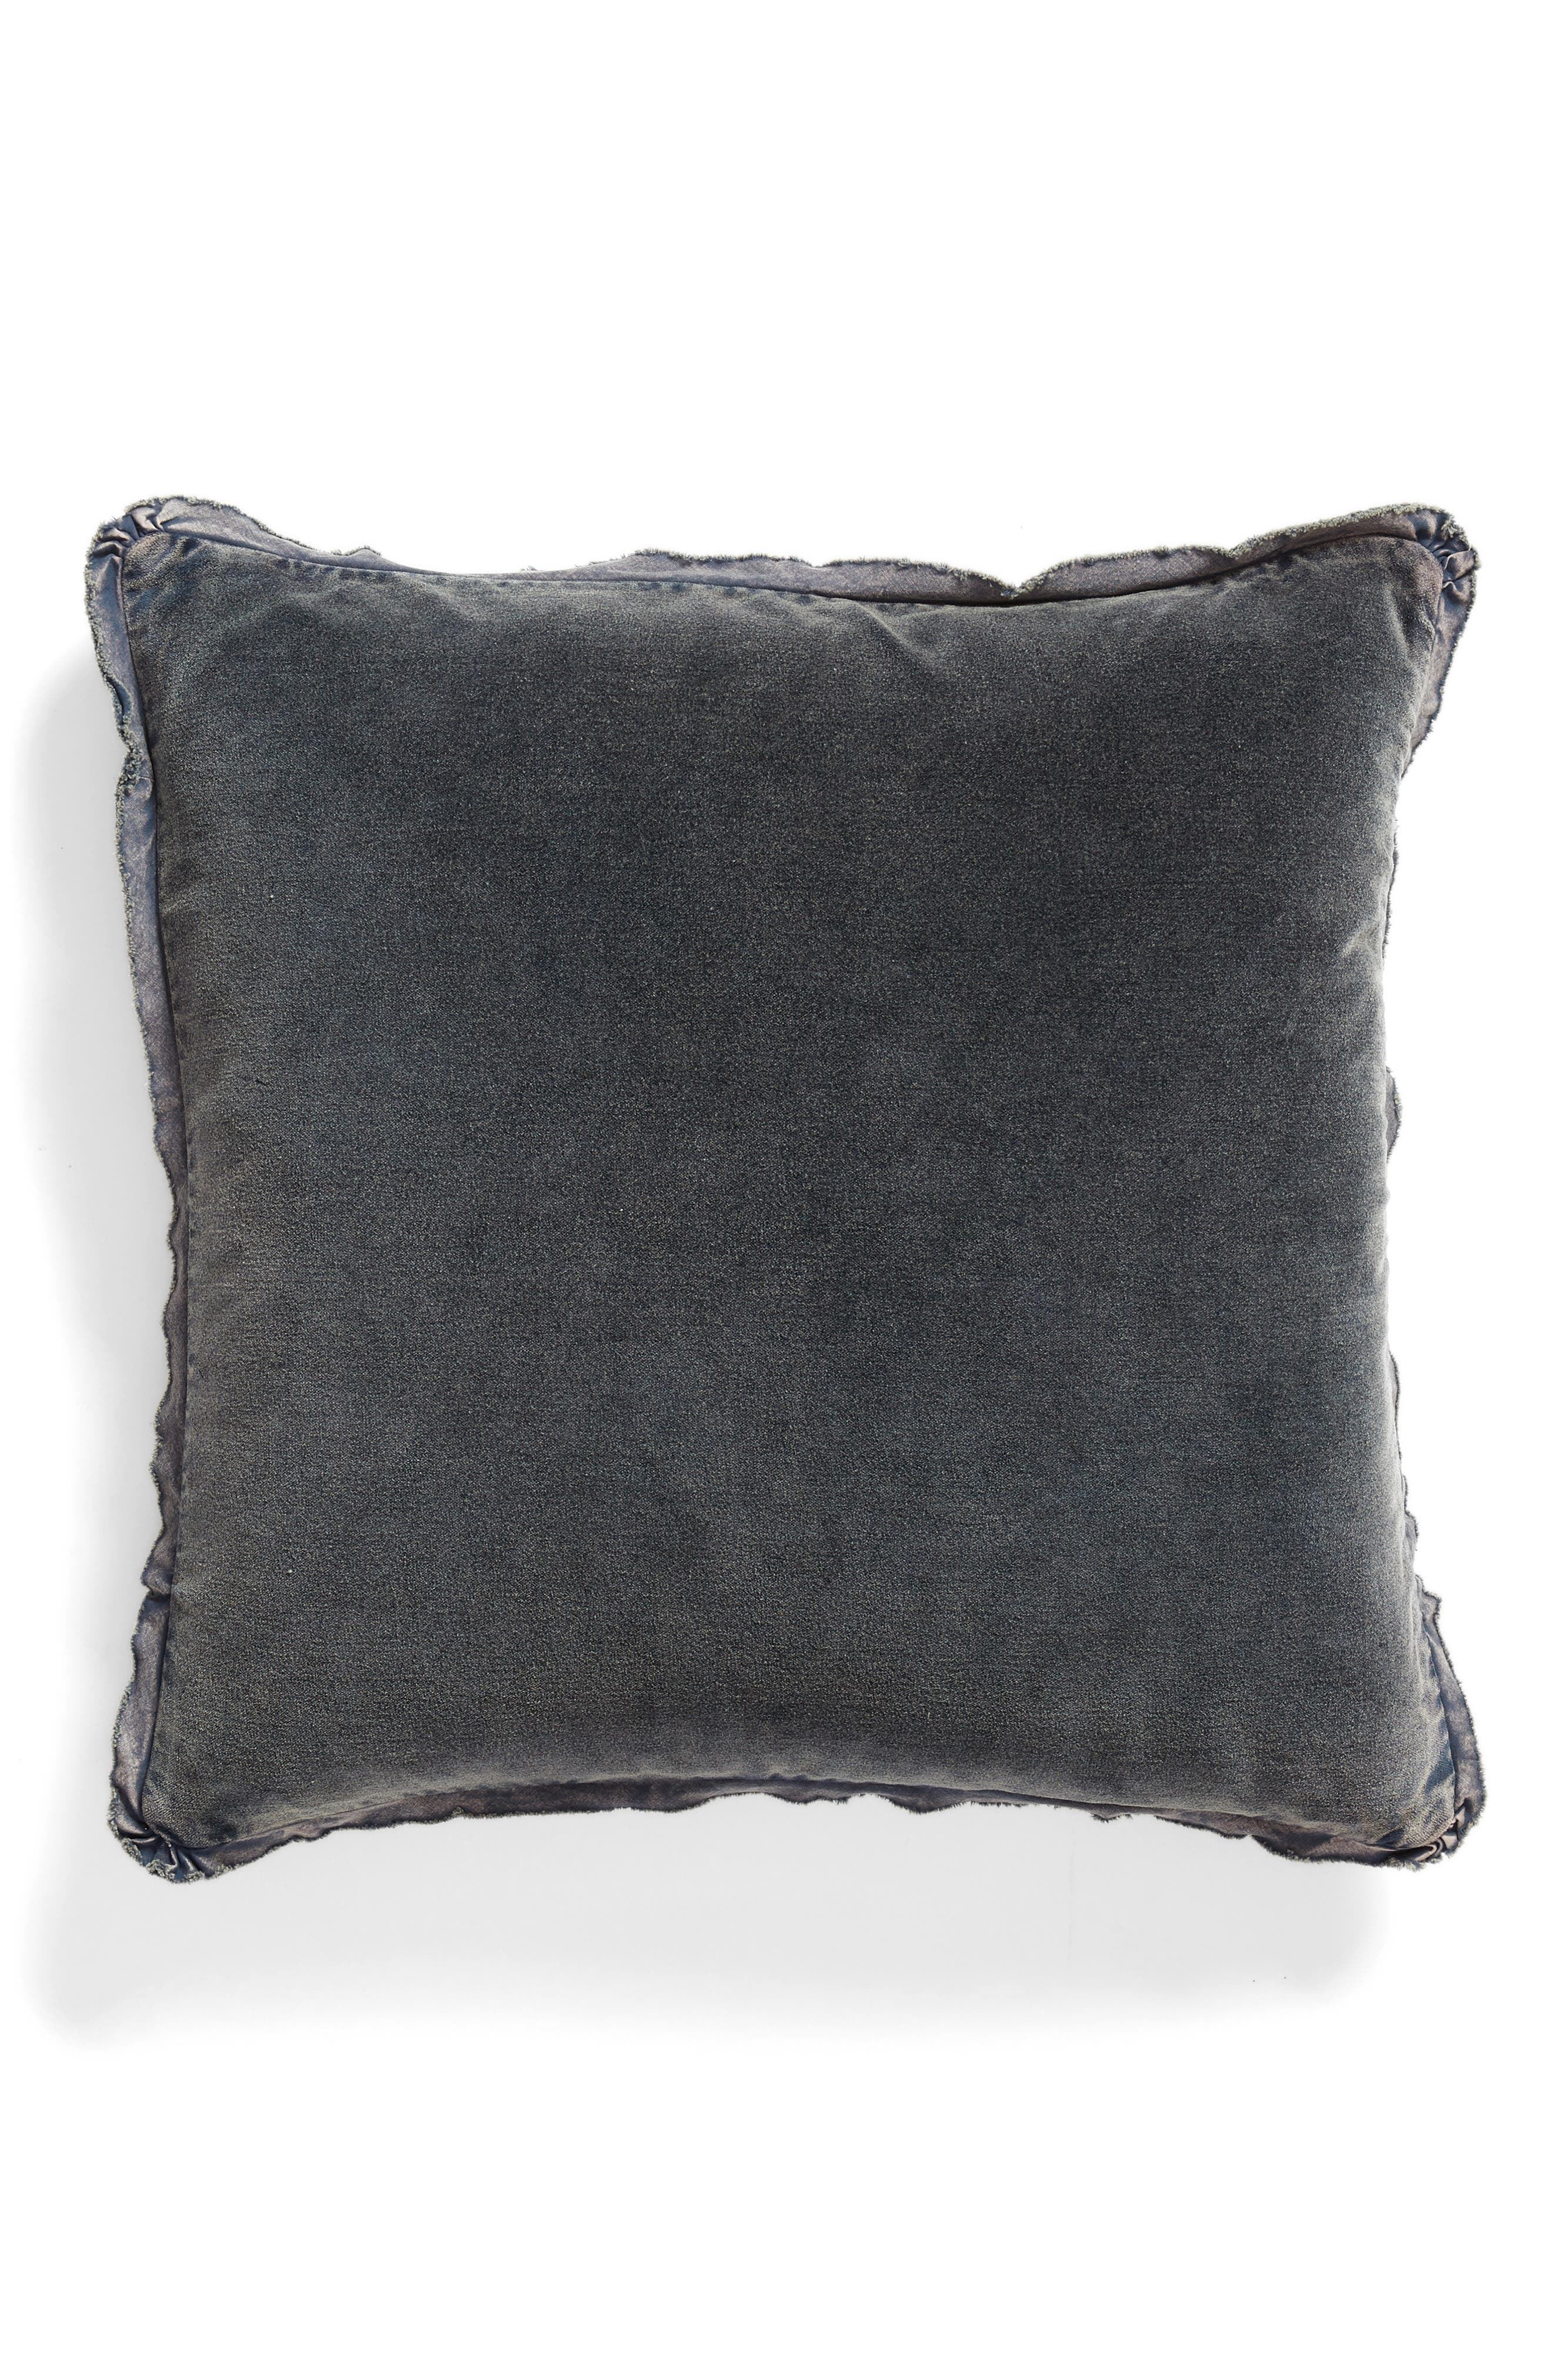 TREASURE & BOND, Stonewash Velvet Accent Pillow, Main thumbnail 1, color, NAVY BLUE